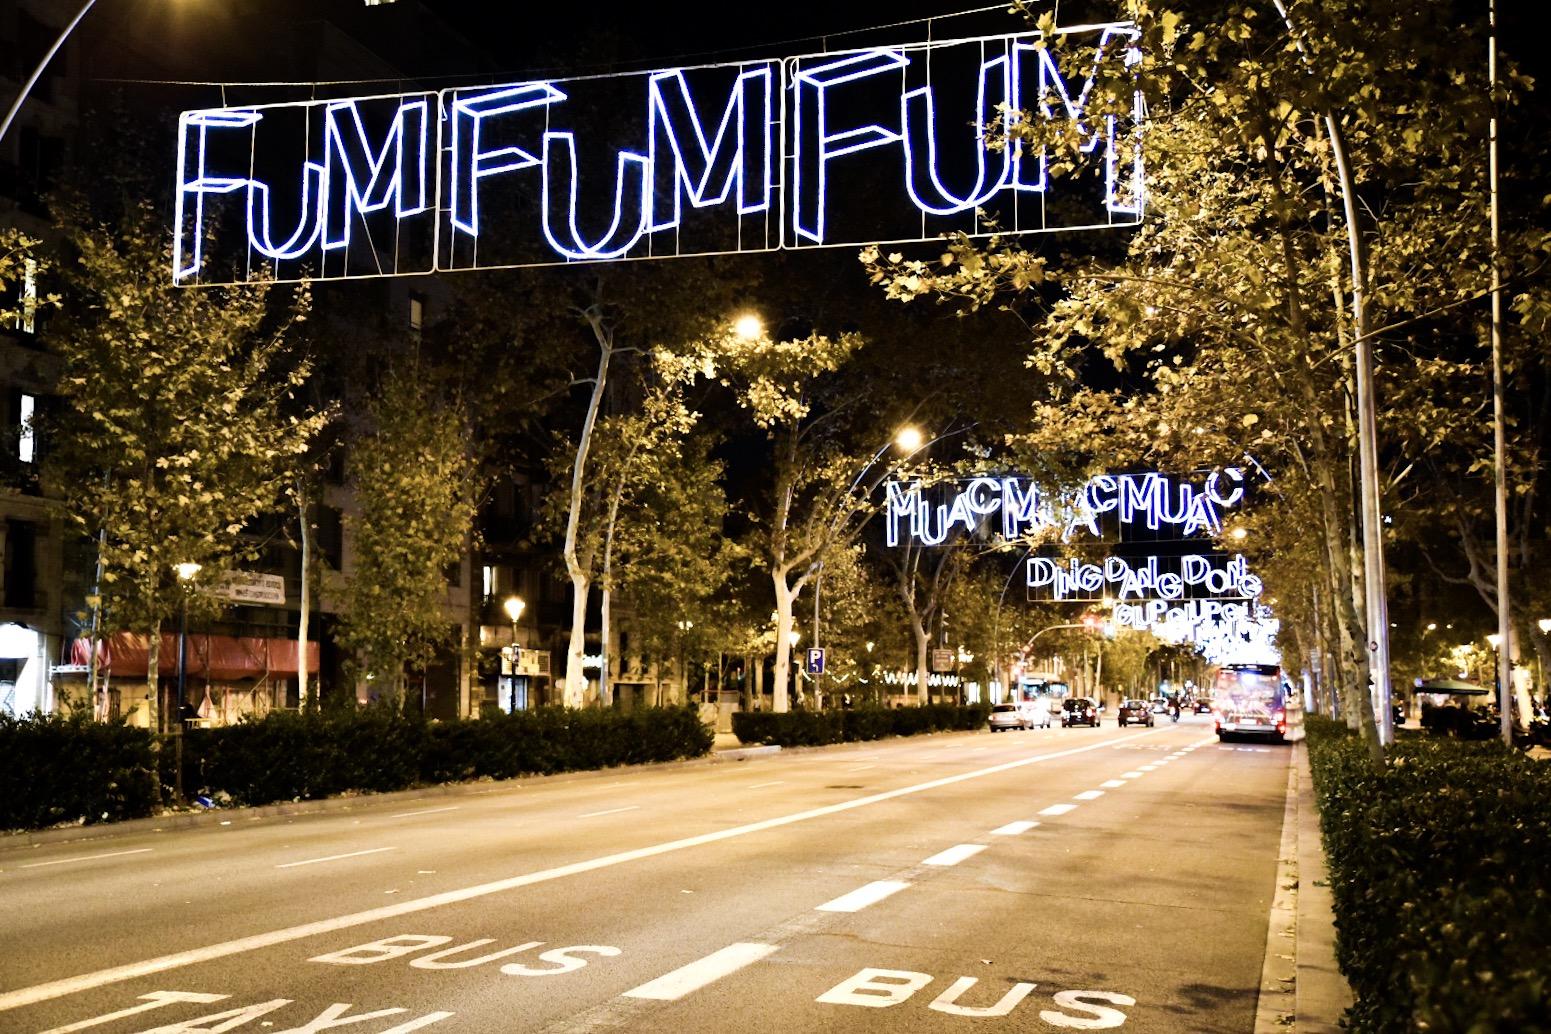 Fum Fum Fum Christmas Shopping in Barcelona